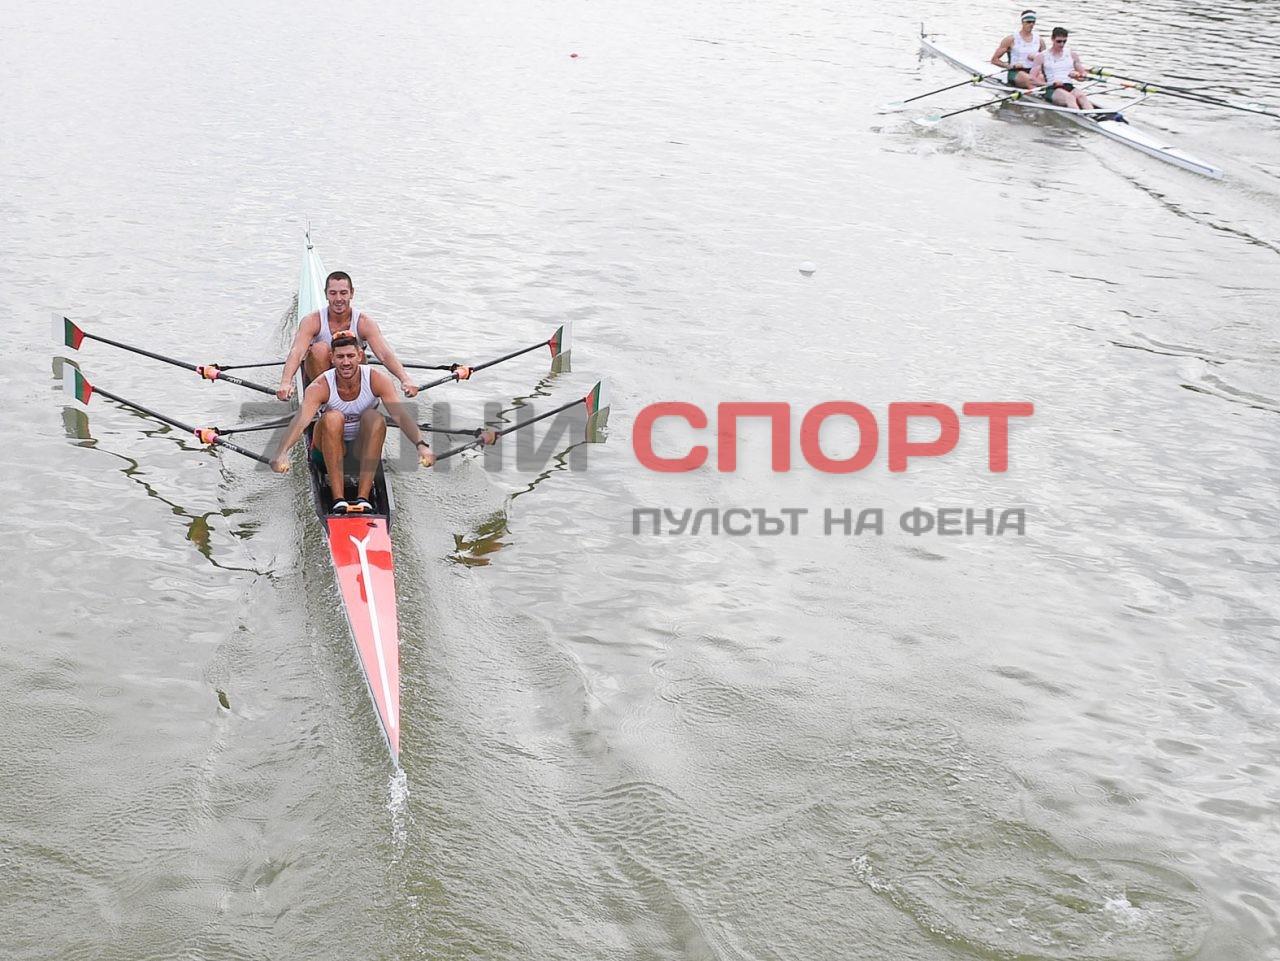 Кристиян Василев и Борис Йотов 52